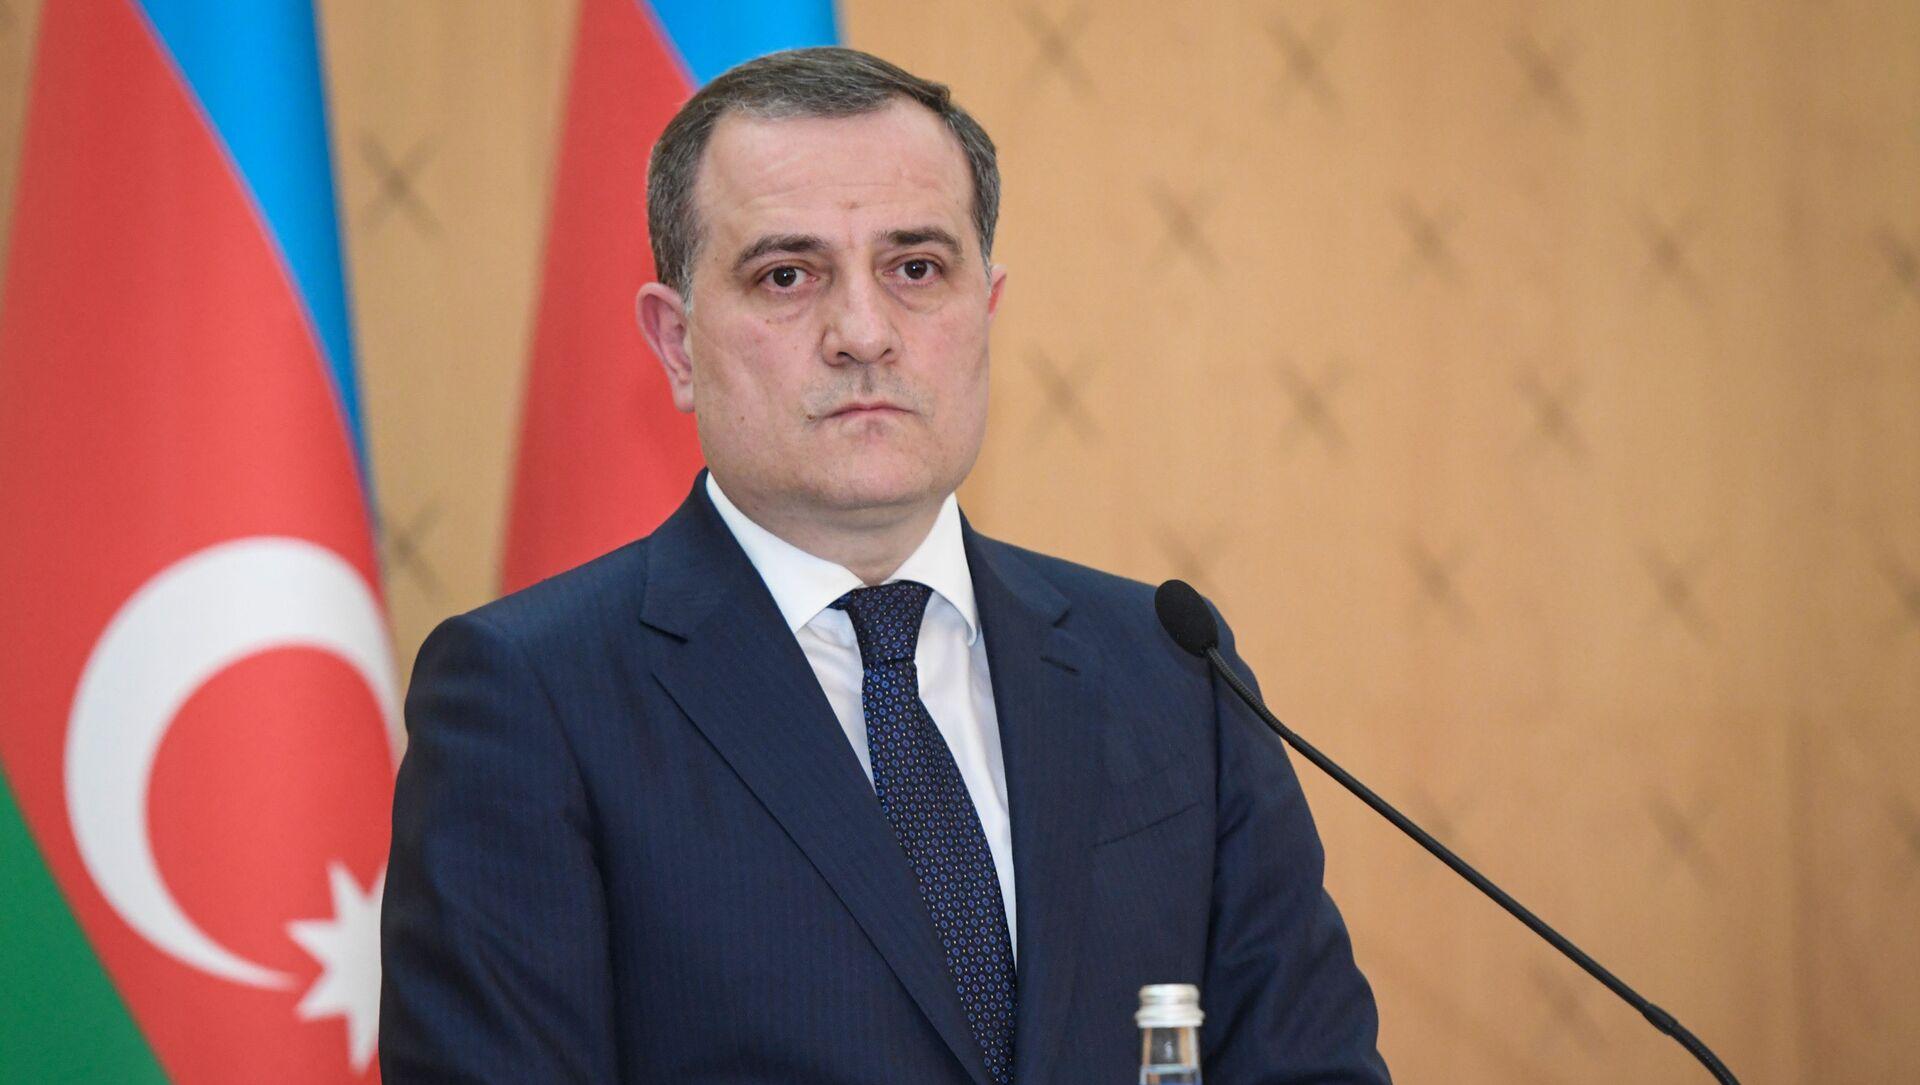 Министр иностранных дел Азербайджана Джейхун Байрамов - Sputnik Азербайджан, 1920, 24.09.2021